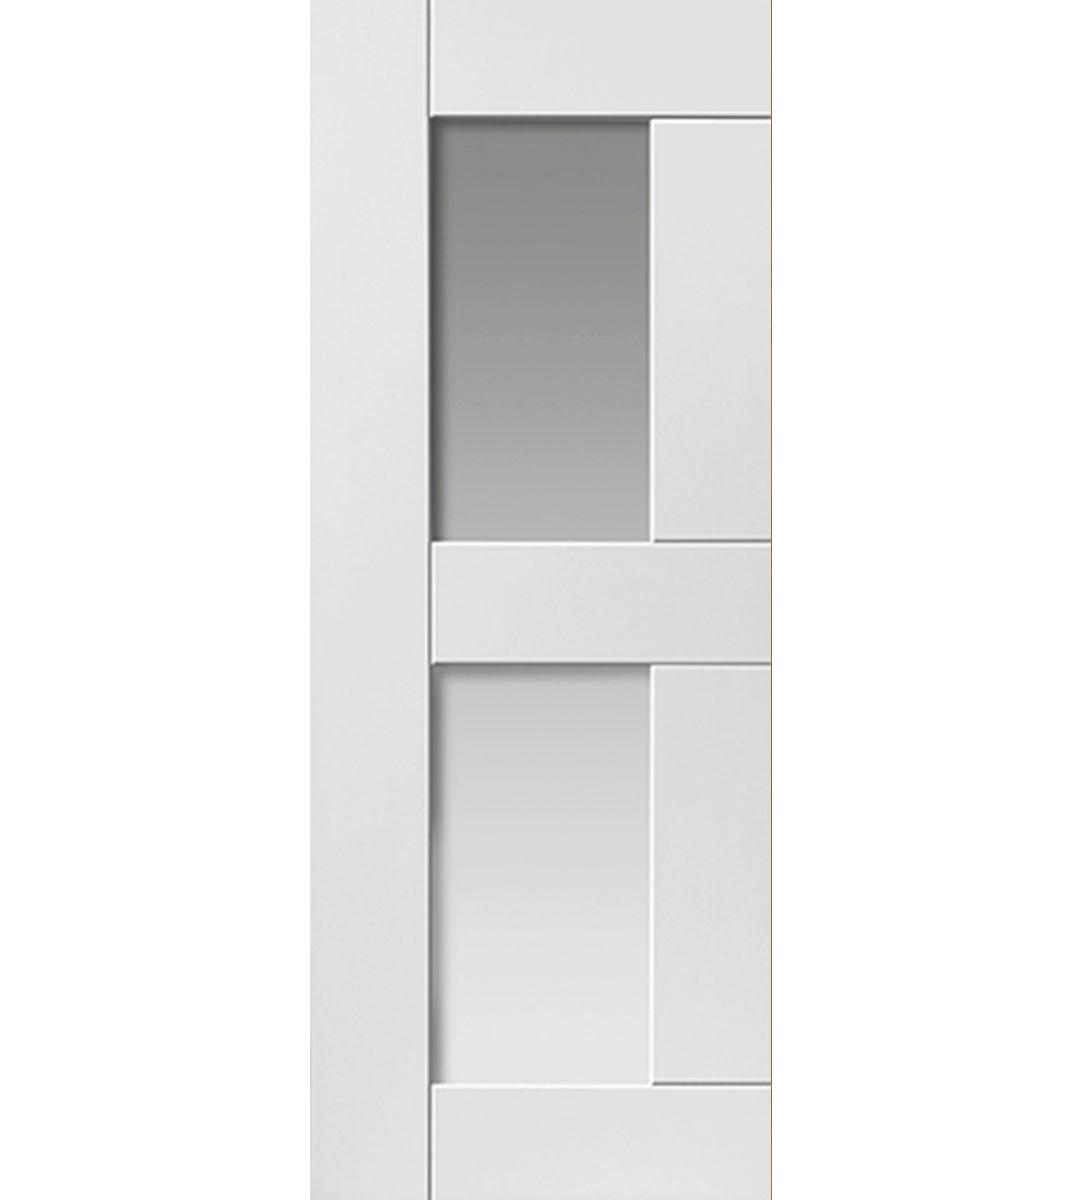 eccentro white glazed interior door